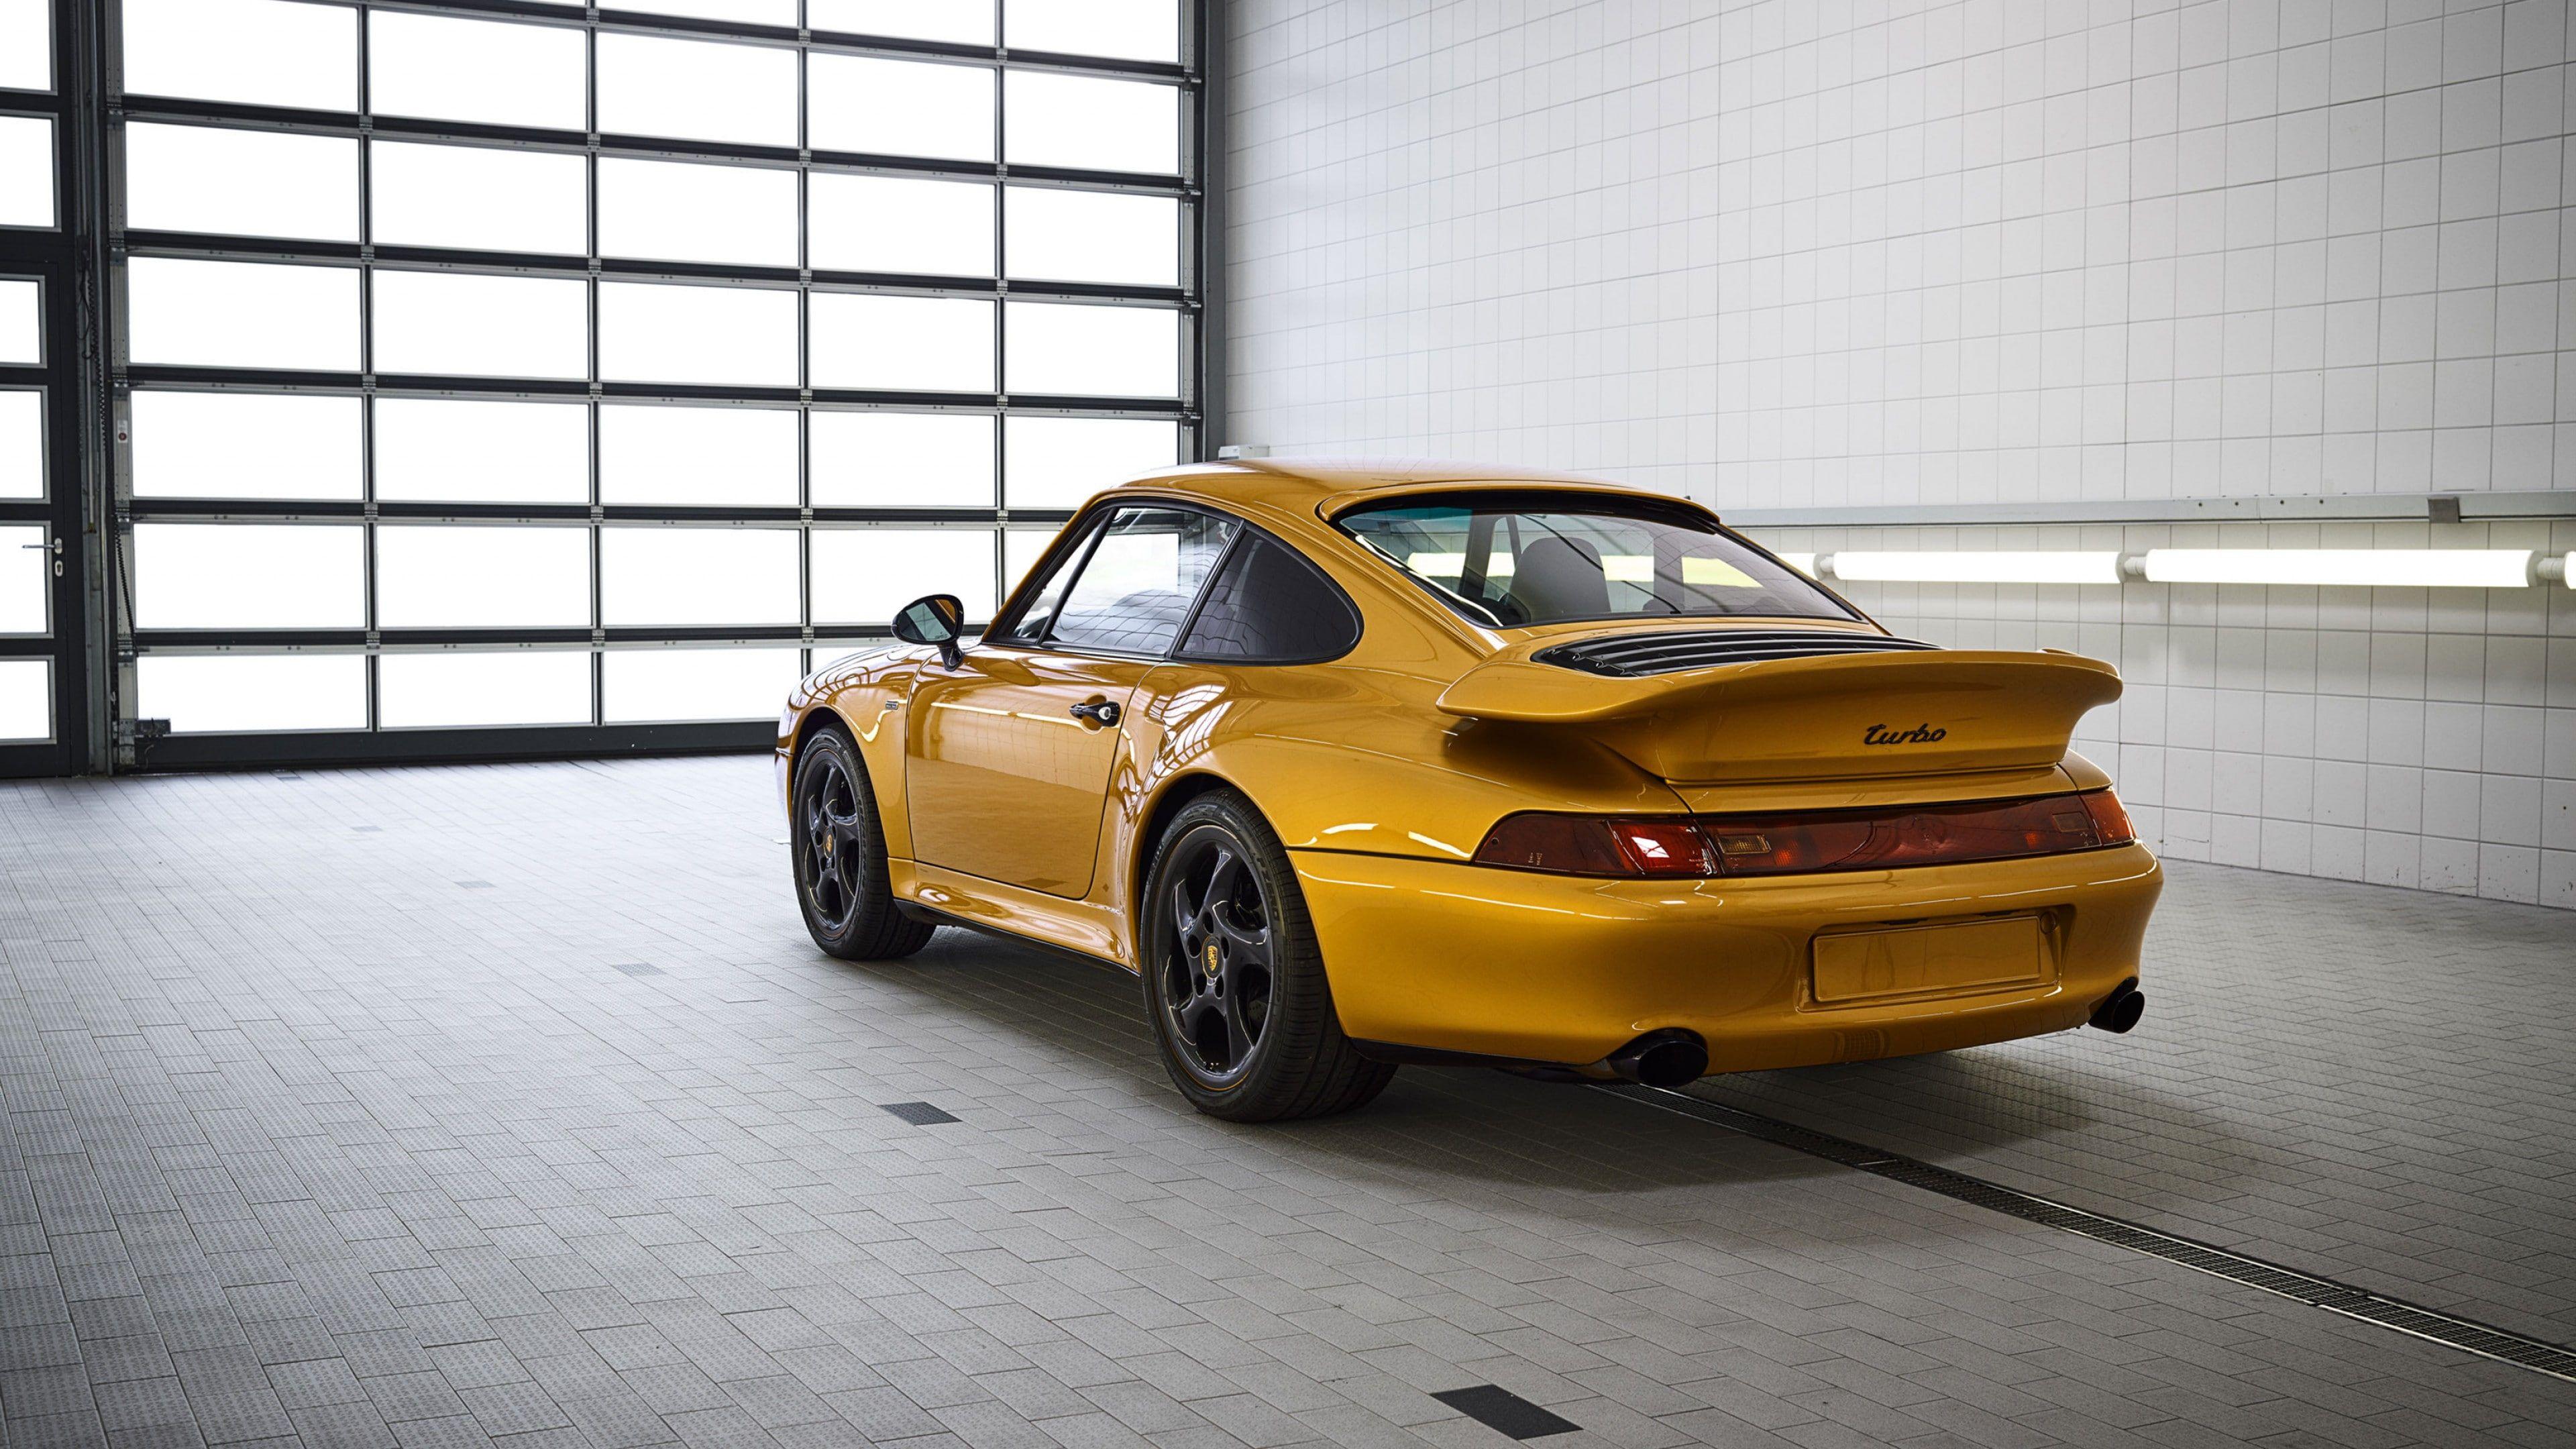 Porsche 993 Turbo S Project Gold 2018 Cars Limited Edition 4k 4k Wallpaper Hdwallpaper Desktop Porsche Panamera Turbo Porsche 993 Porsche